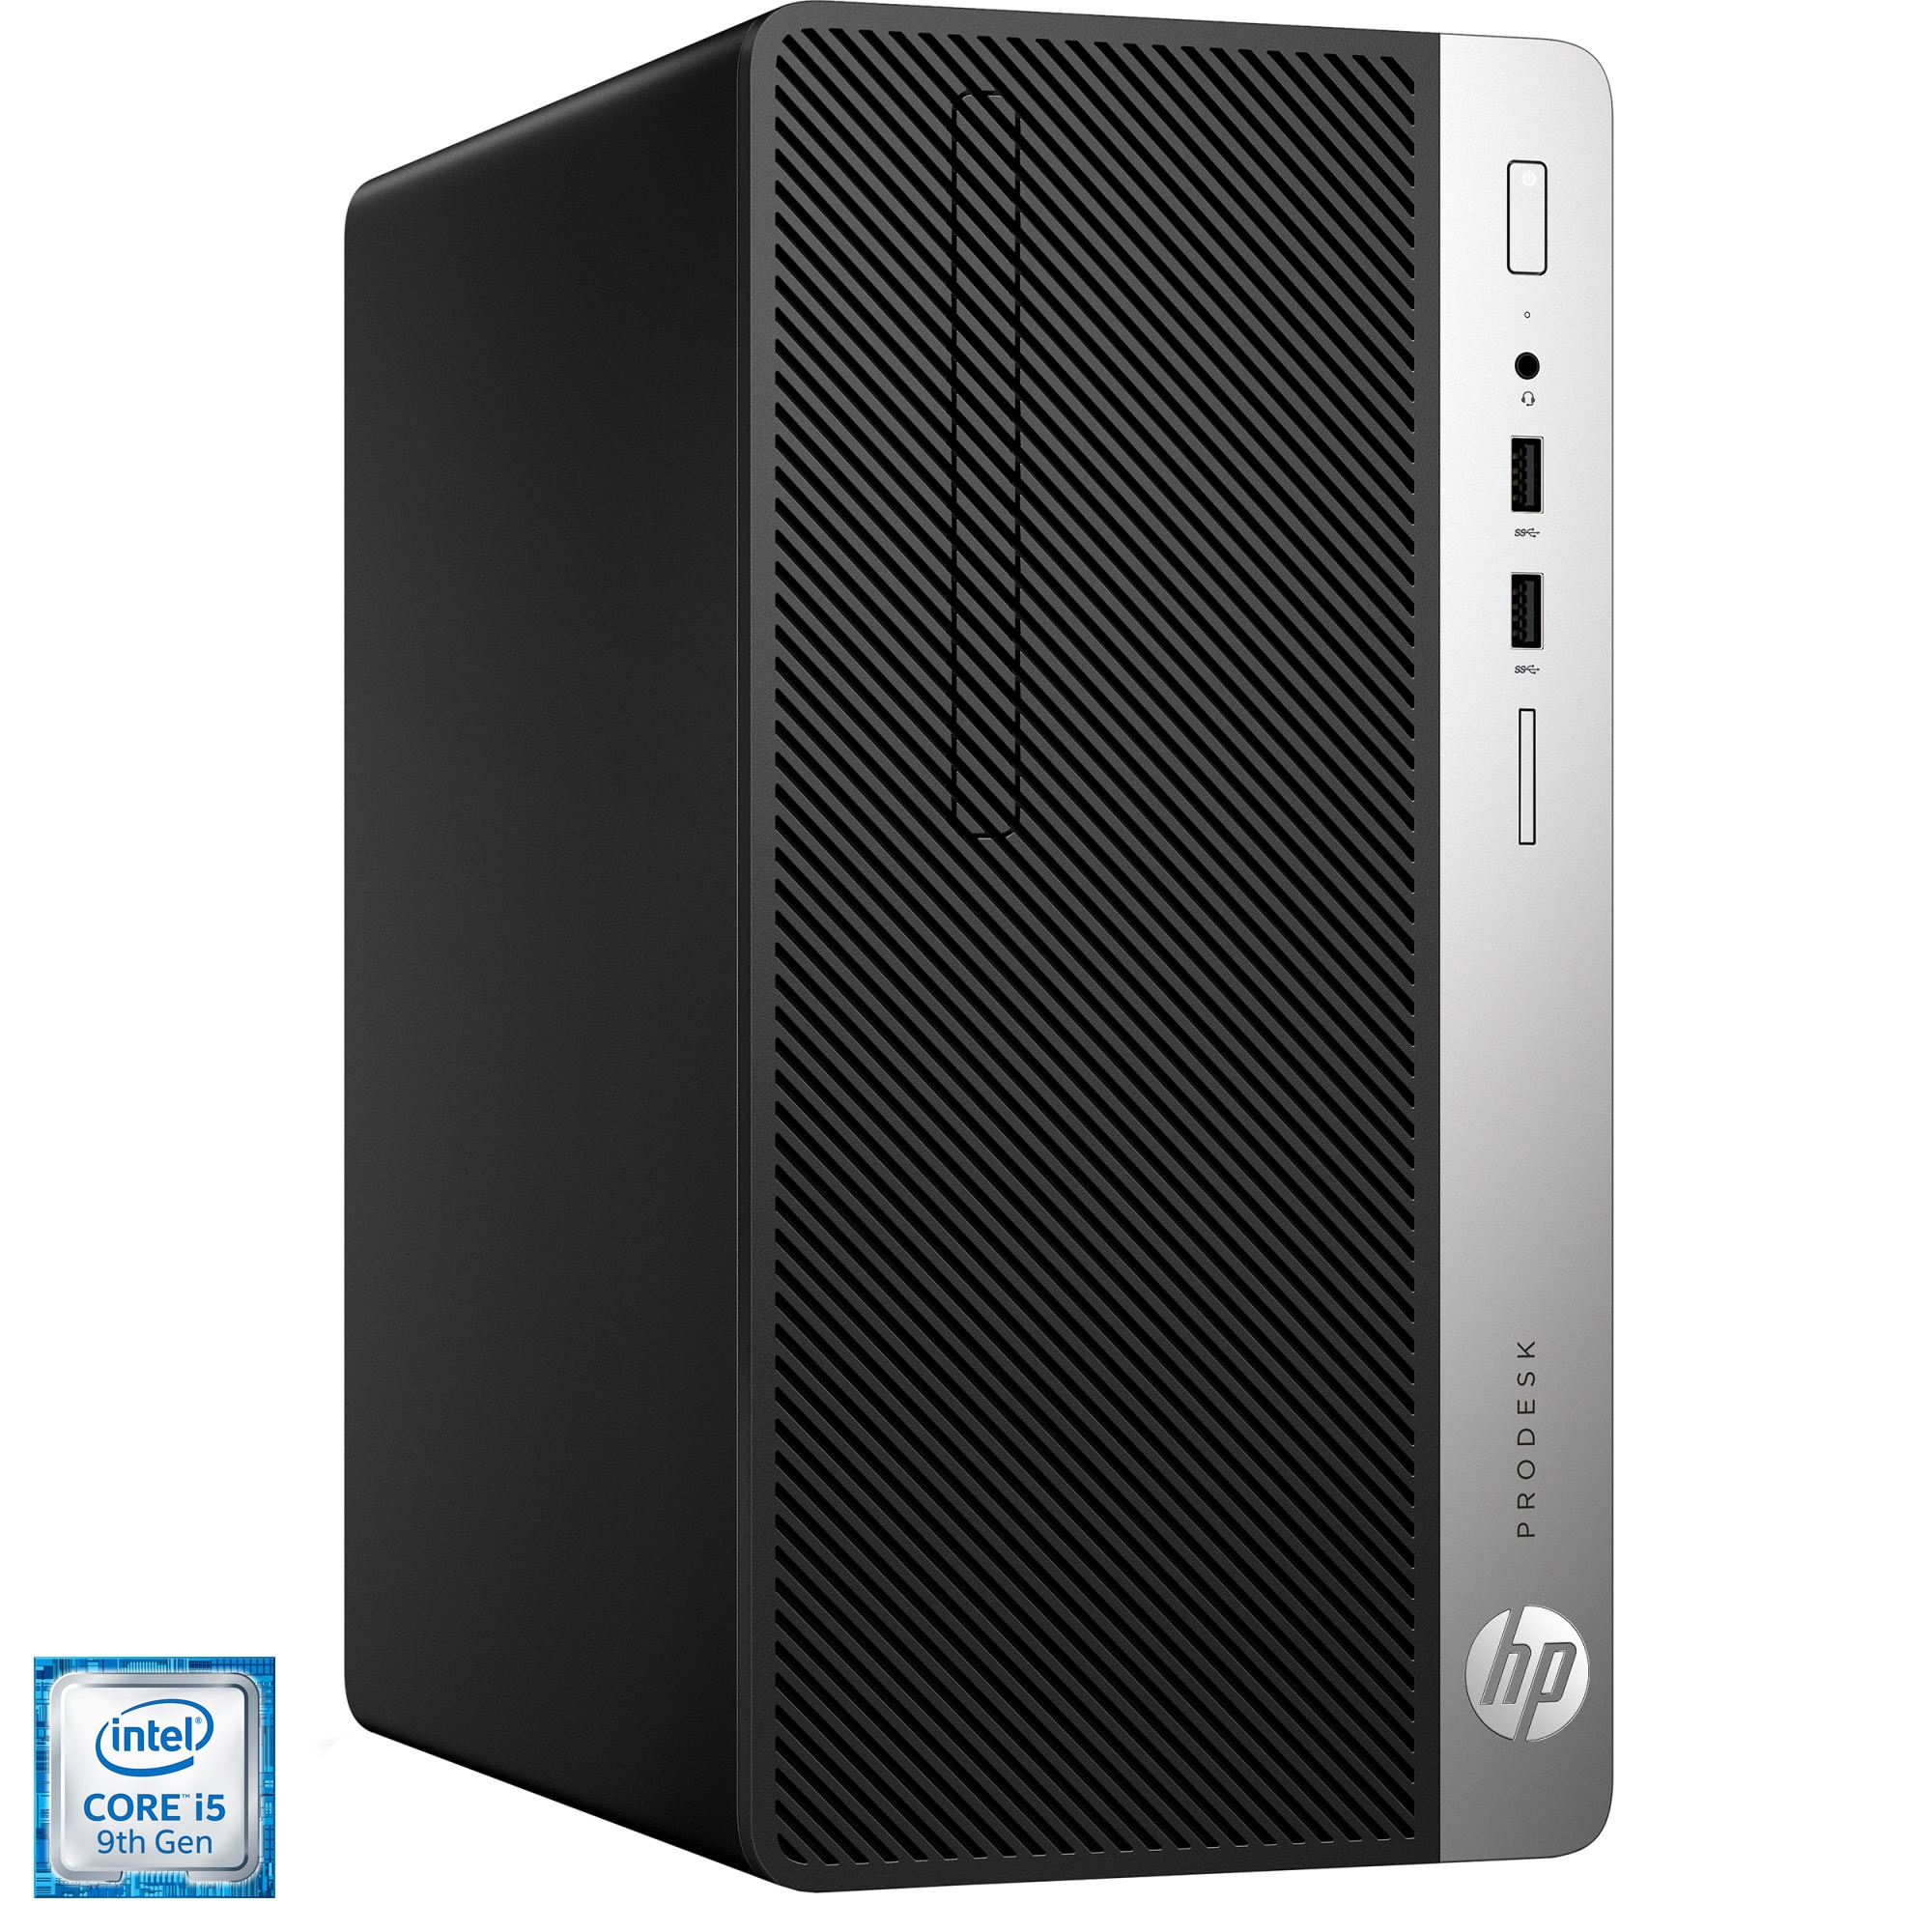 Fotografie Sistem Desktop PC HP ProDesk 400 G6 cu procesor Intel® Core™ i5-9500 pana la 4.40 GHz, Coffee Lake, 8GB DDR4, 1TB + 256GB SSD, Intel® UHD Graphics 630, Microsoft Windows 10 Pro